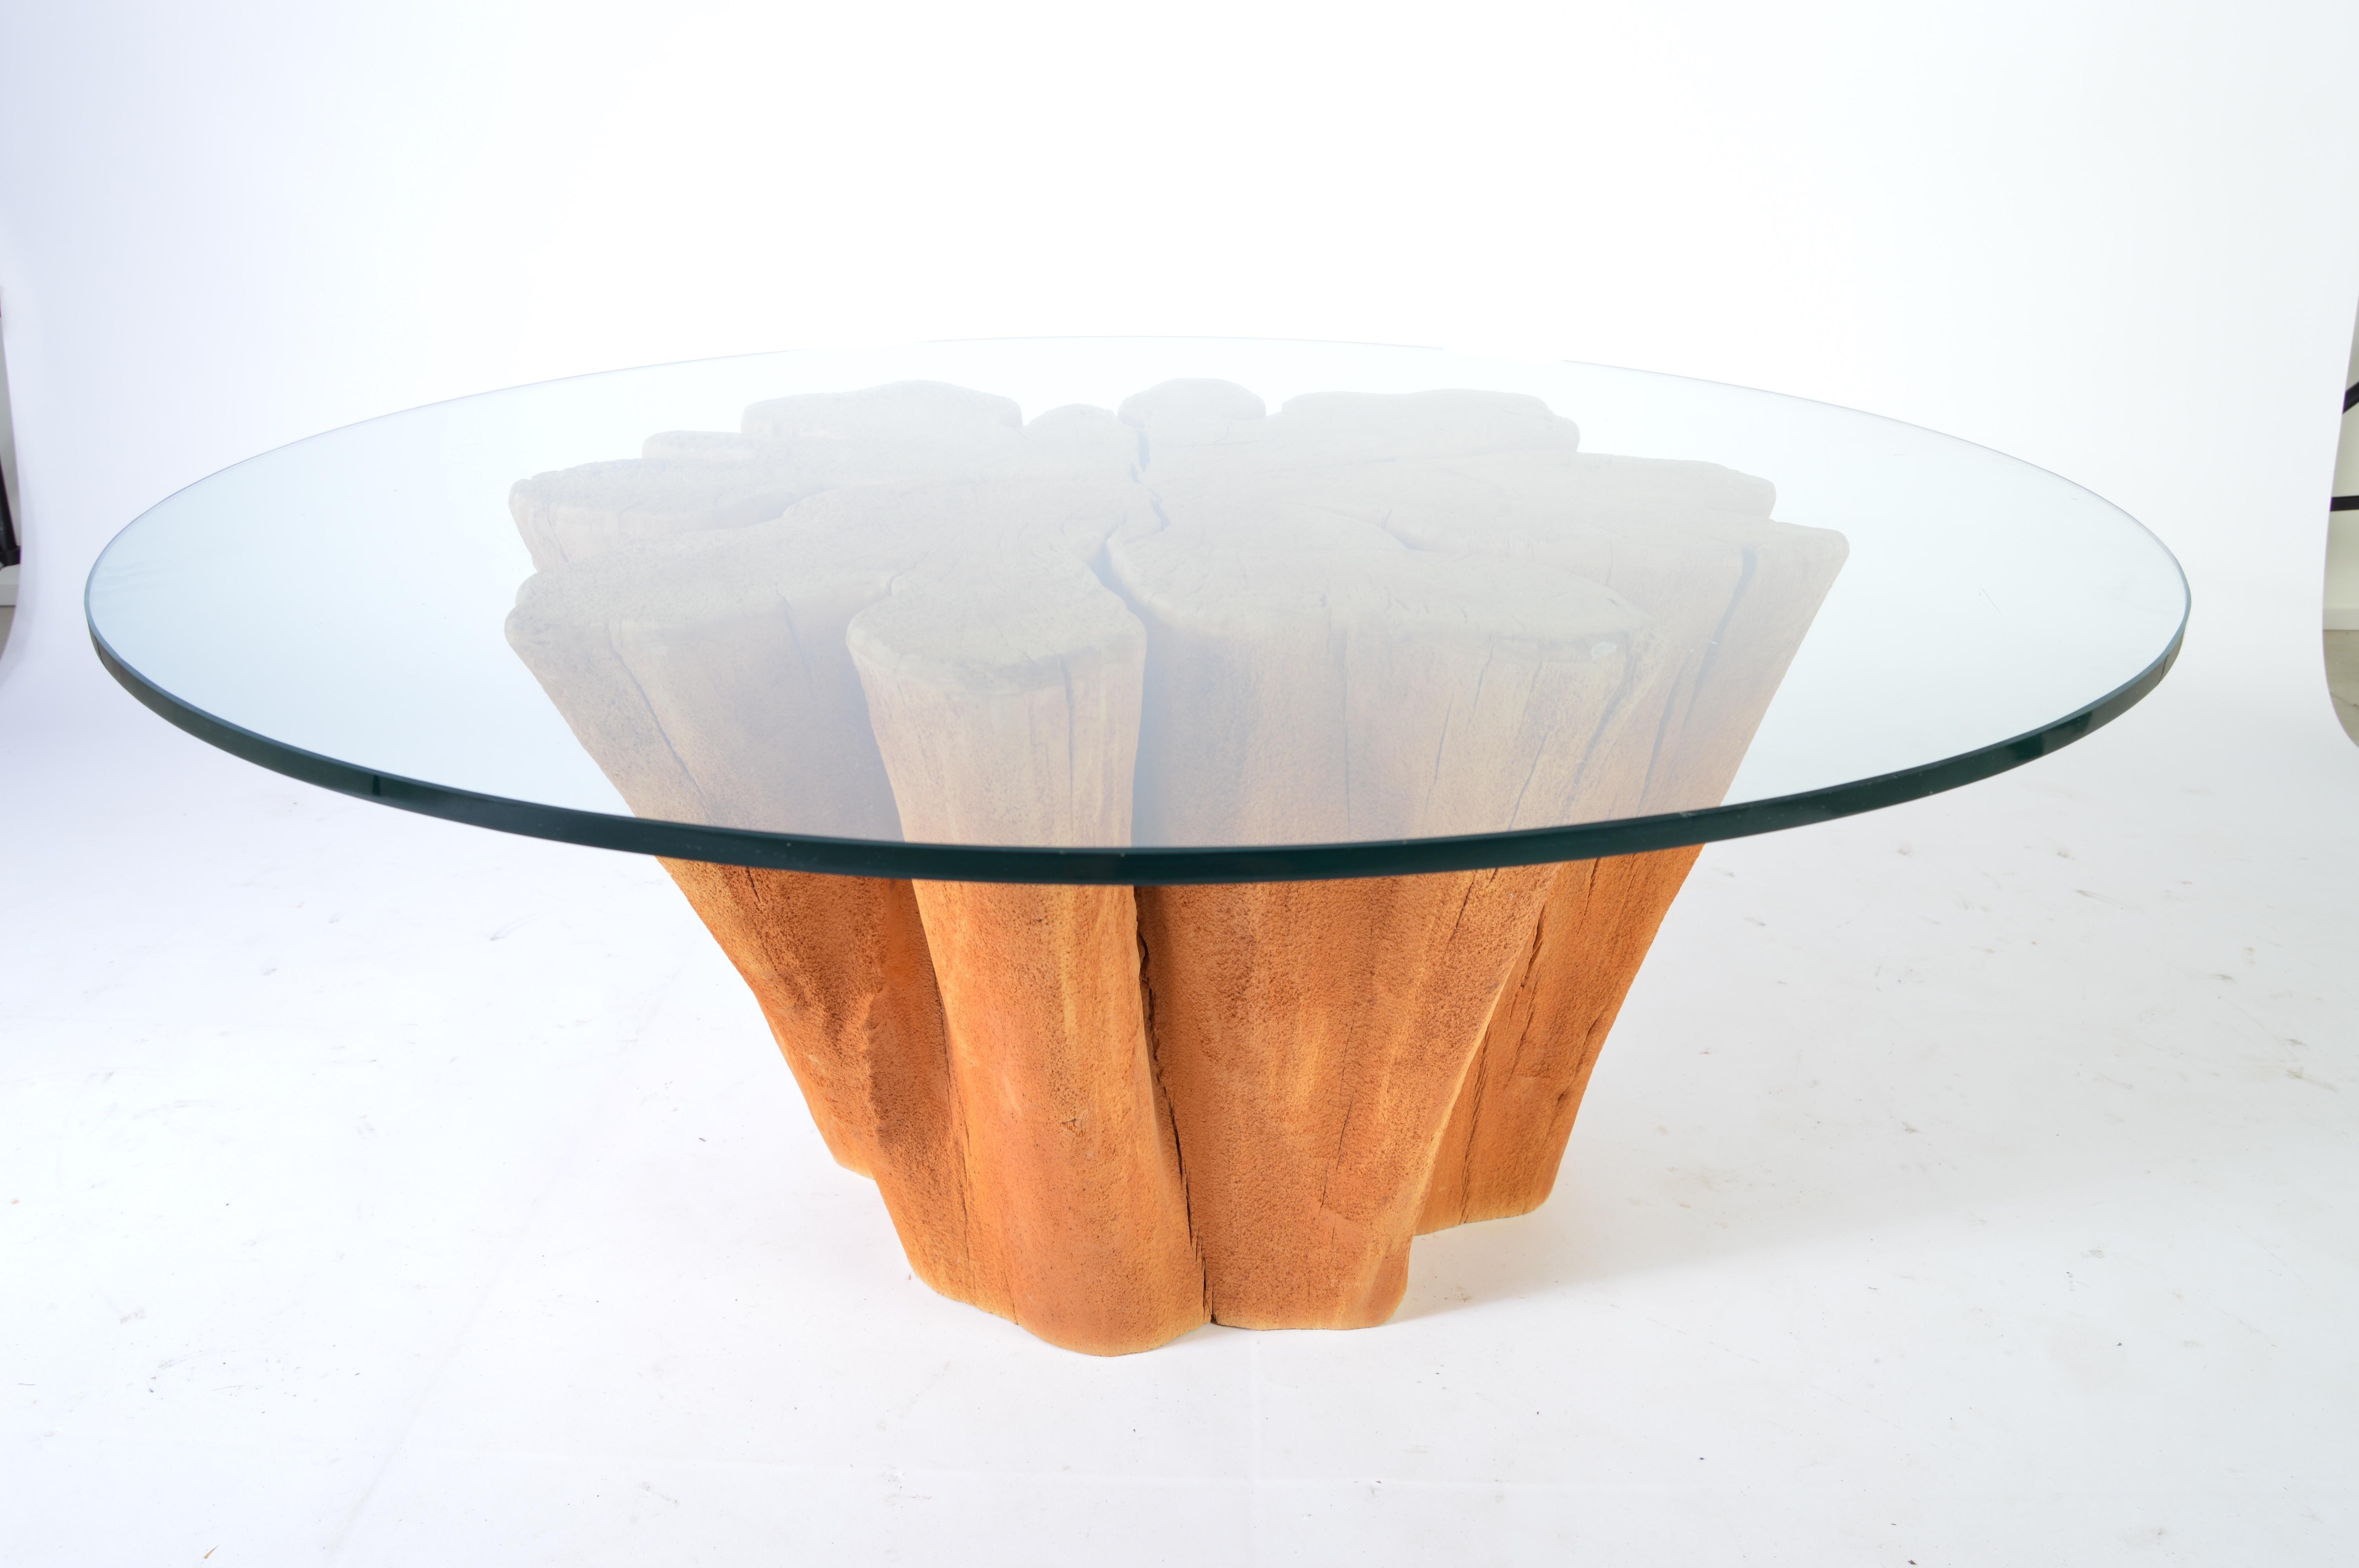 Freeform Cypress Tree Trunk Tail Table At 1stdibs